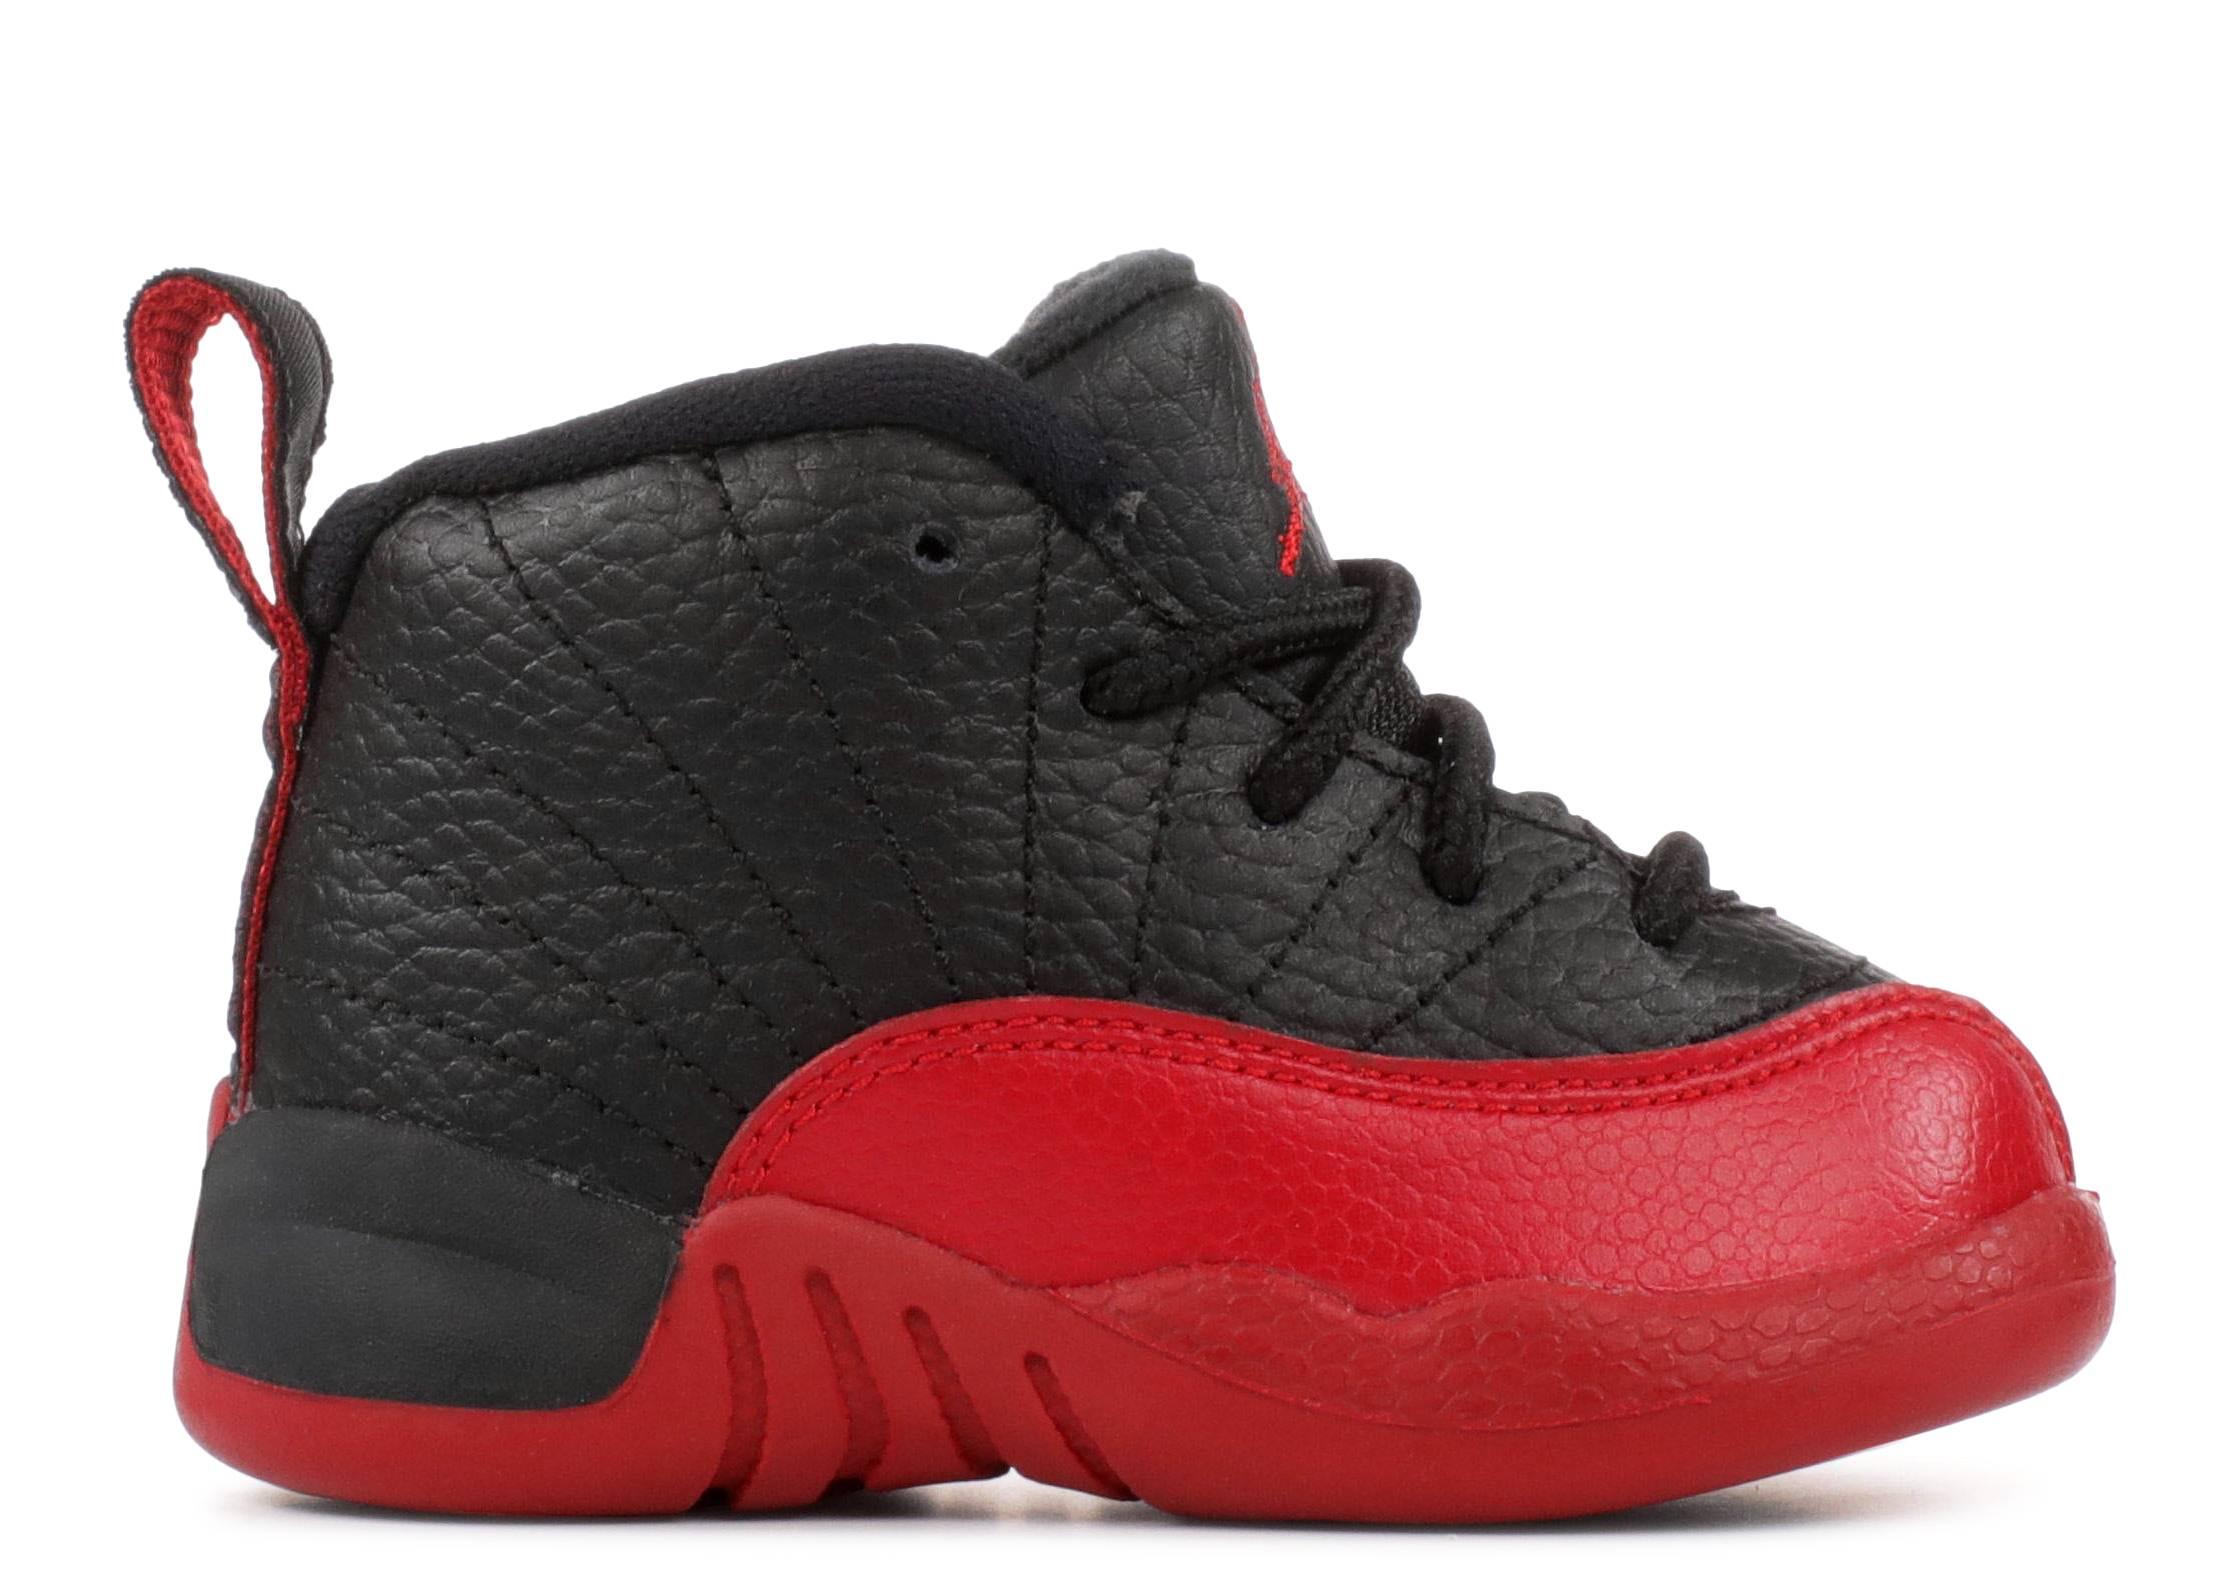 7a55812ee3c102 Jordan 12 Retro Bt - Air Jordan - 850000 002 - black varsity red ...